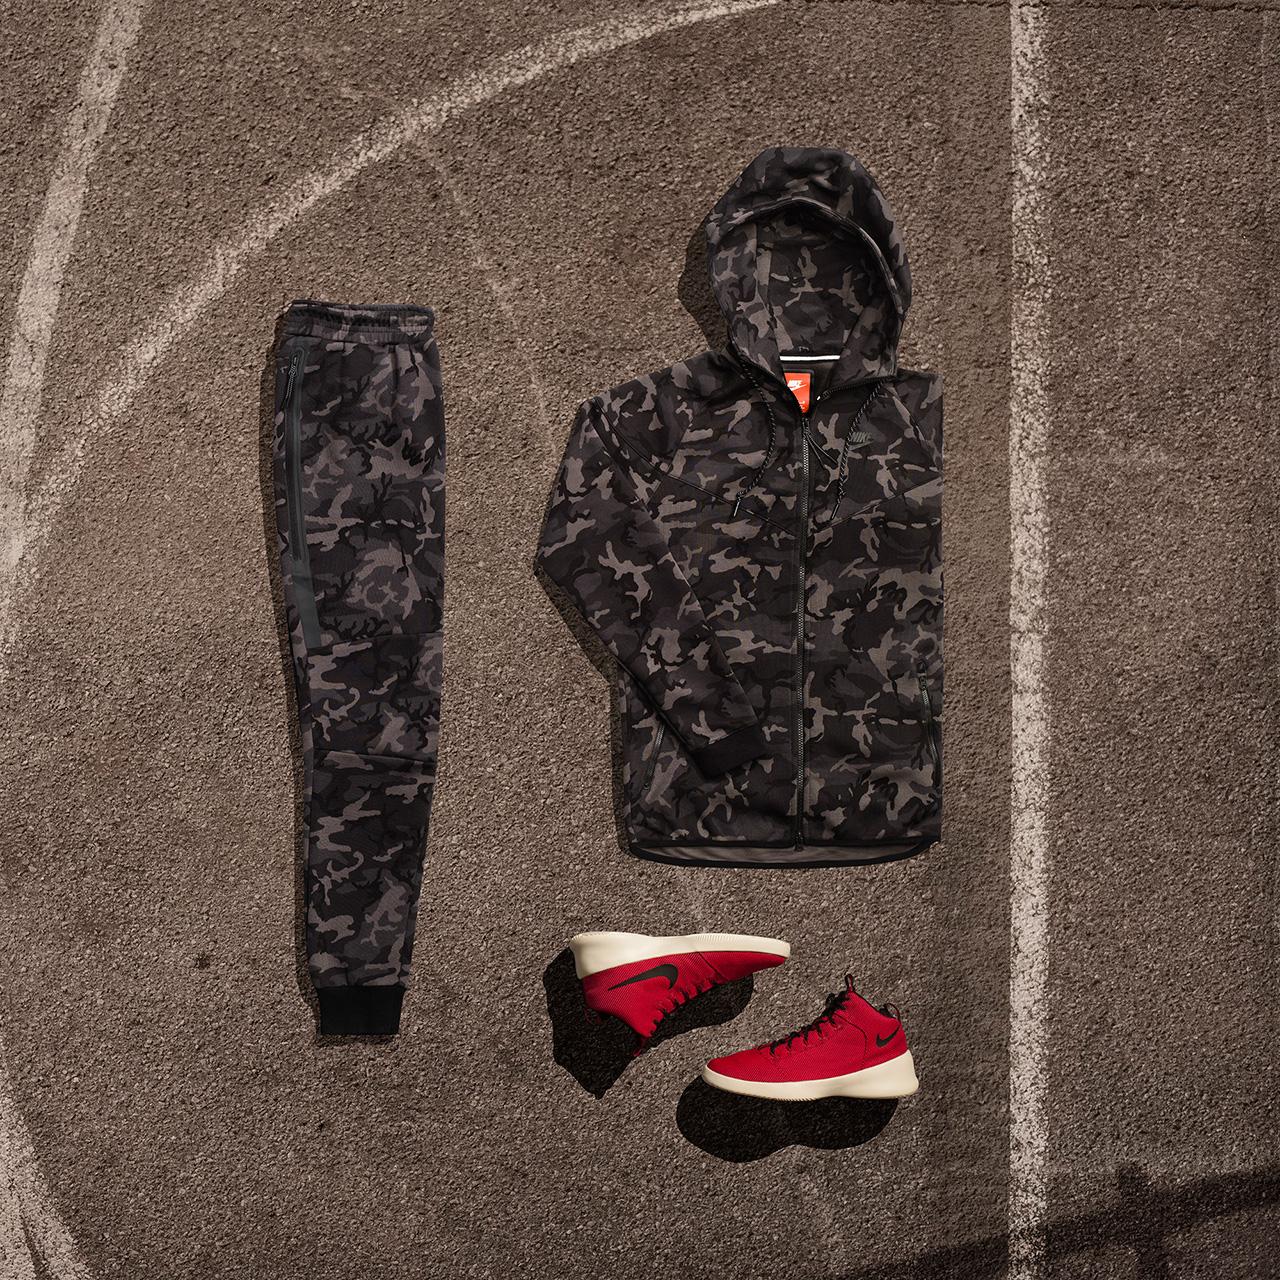 03_JR_20150613_Nike_Textures_02812_HF_HFR3